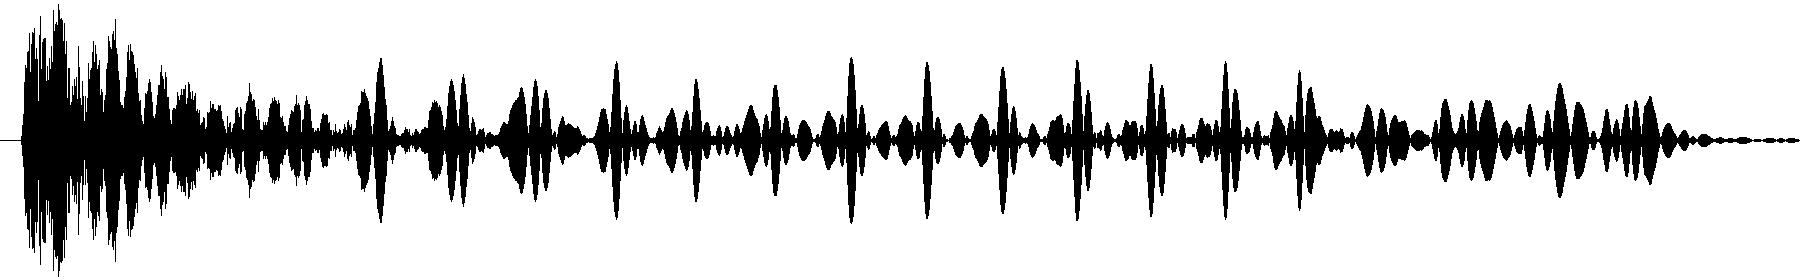 perc 1 44